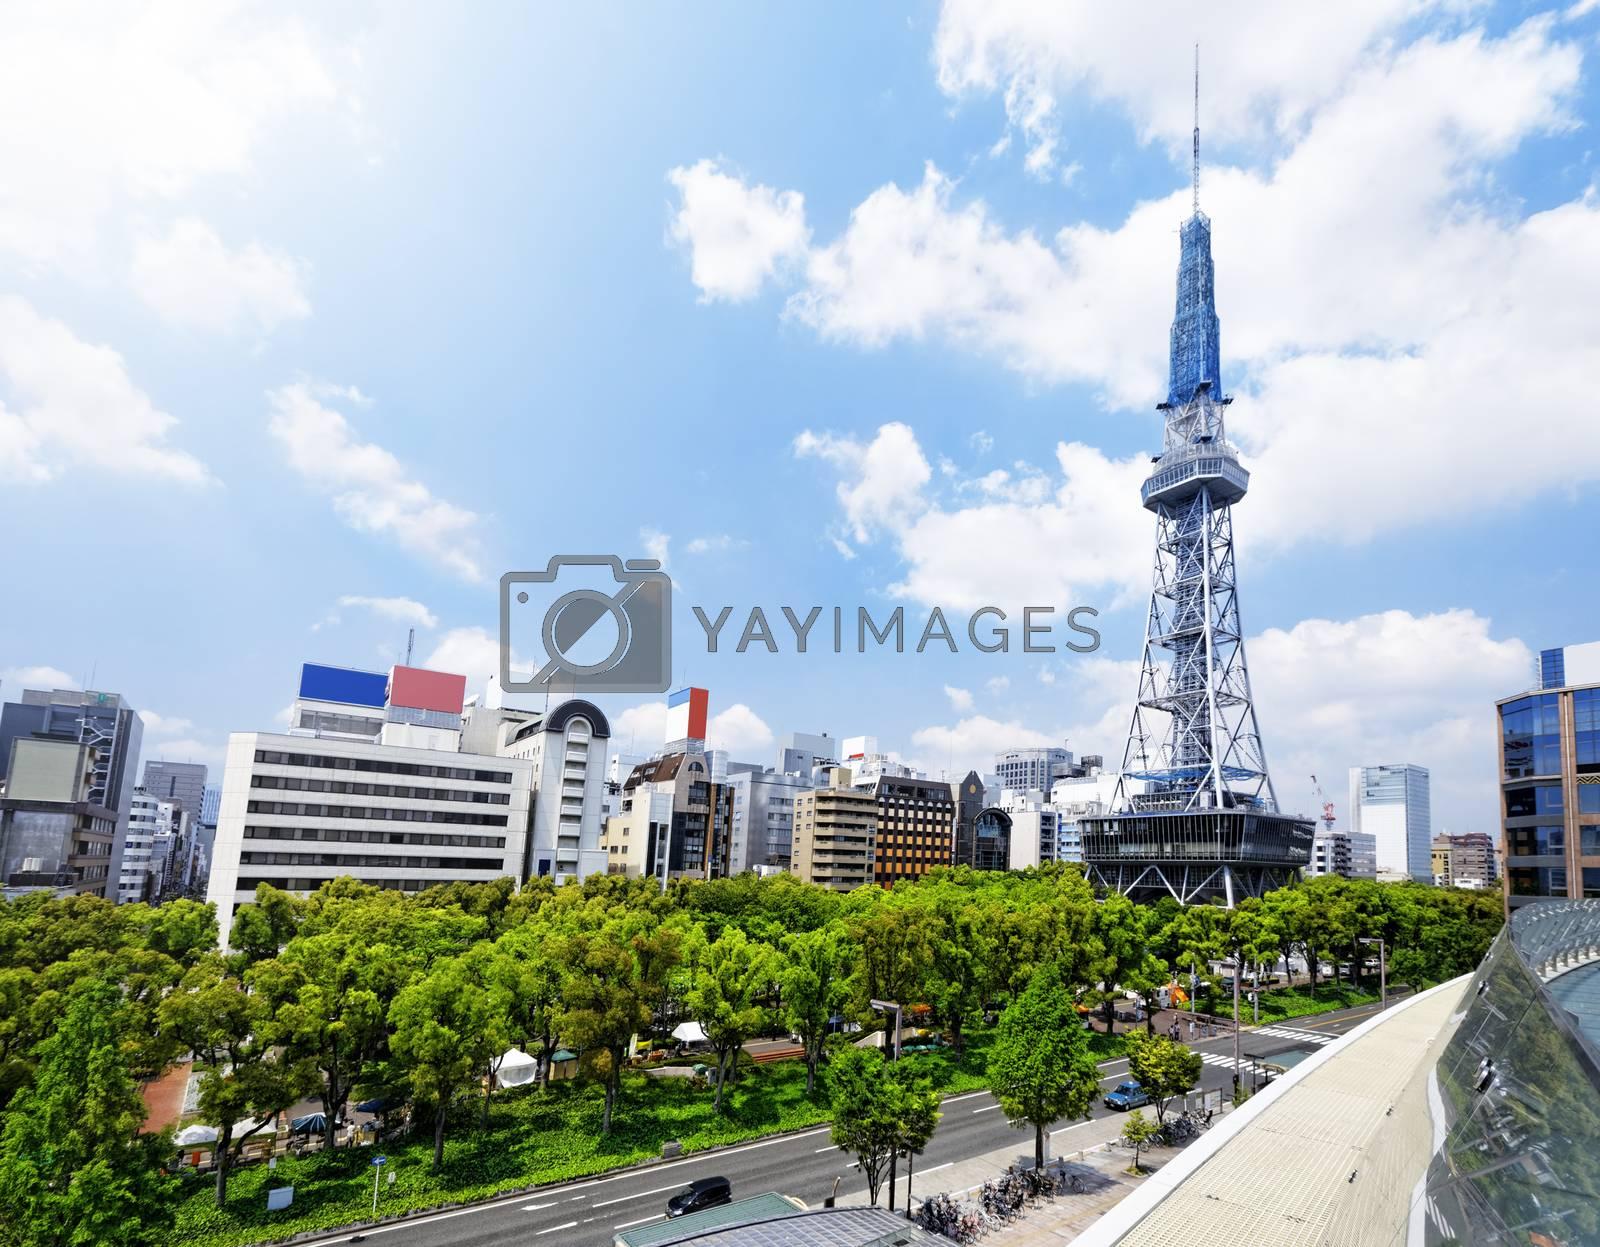 Royalty free image of Nagoya downtown daytime, Japan City by cozyta